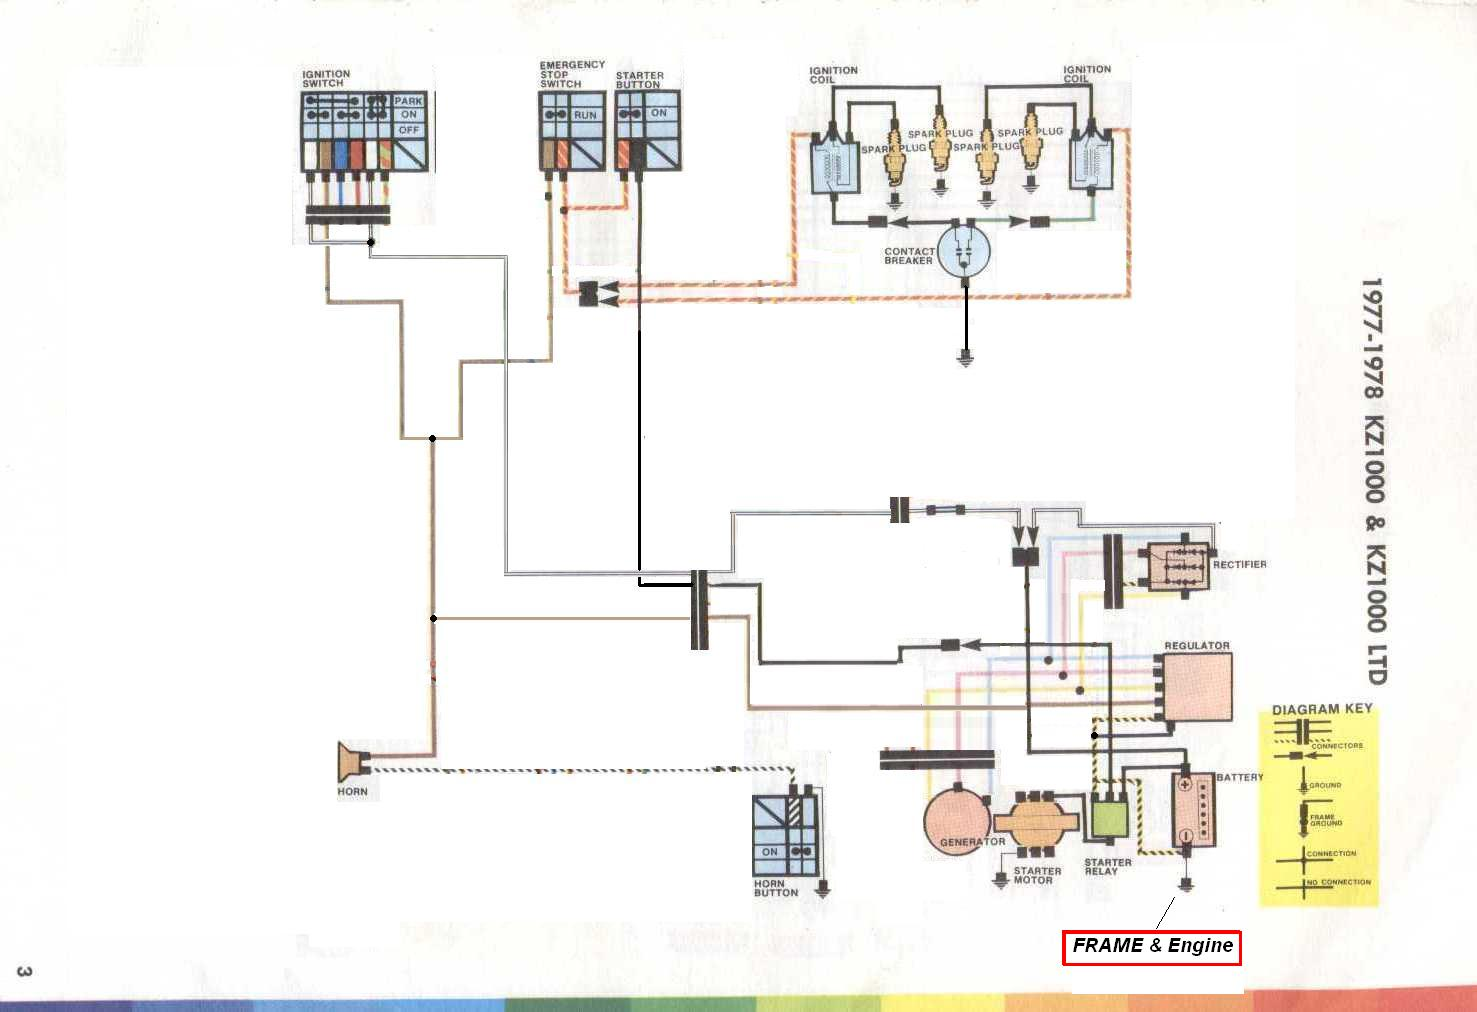 [EQHS_1162]  YR_6276] Kzrider Archives Wiring Diagram For Z650 Kawasaki Kz Motorcycles | Kz650 Wiring Diagram |  | Unre Trua Odga Mohammedshrine Librar Wiring 101